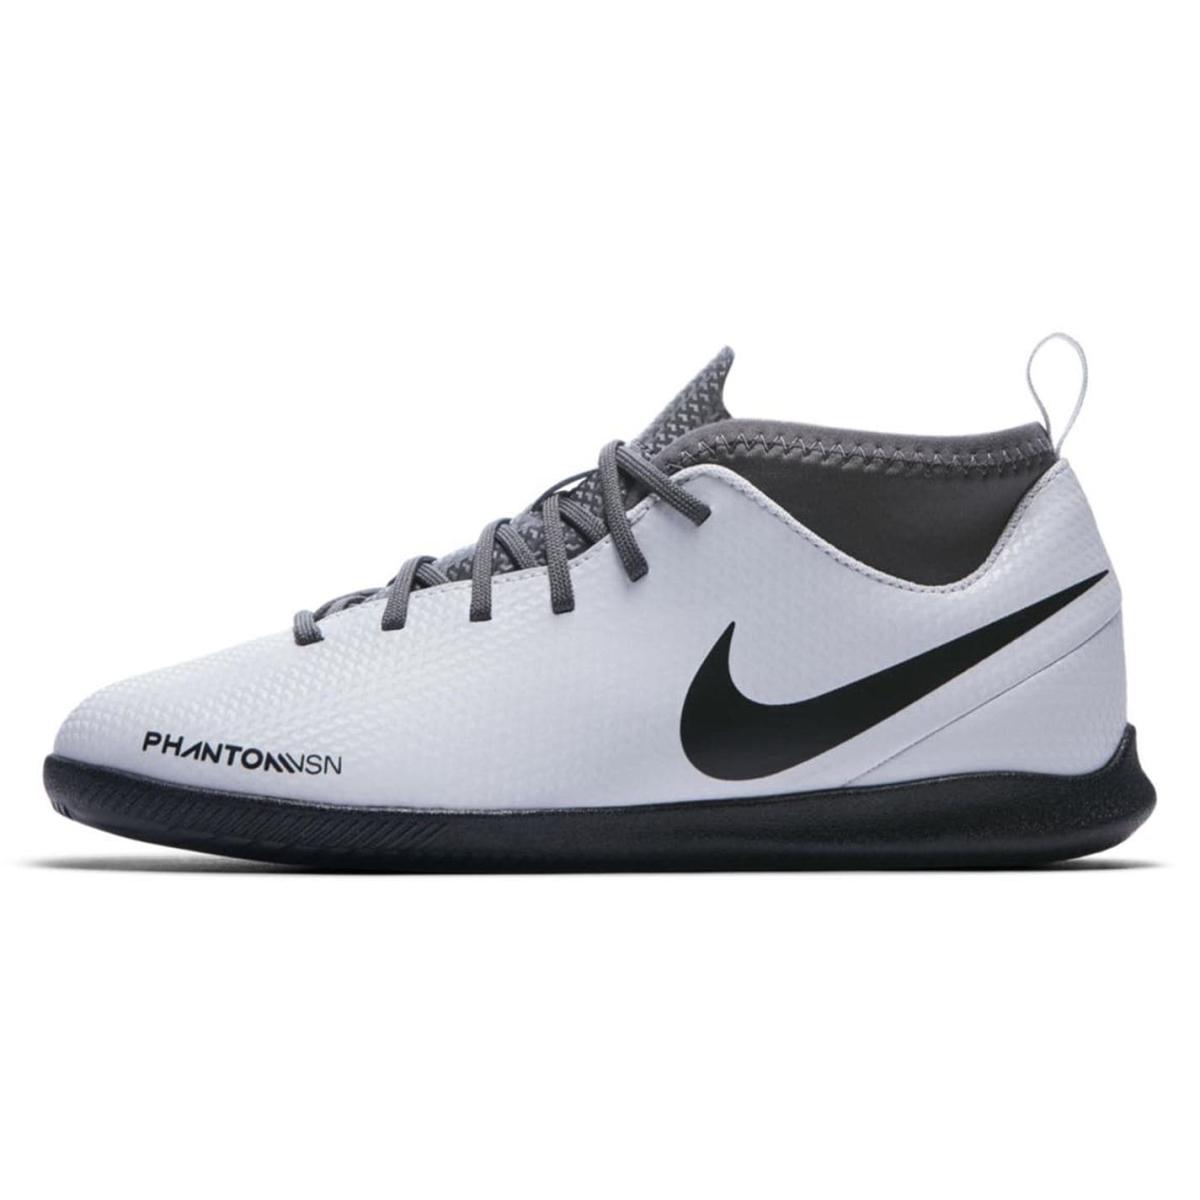 Nike Phantom Vision Club Df Hallenschuhe Fußballschuhe Indoor Kinder Jungen 5385